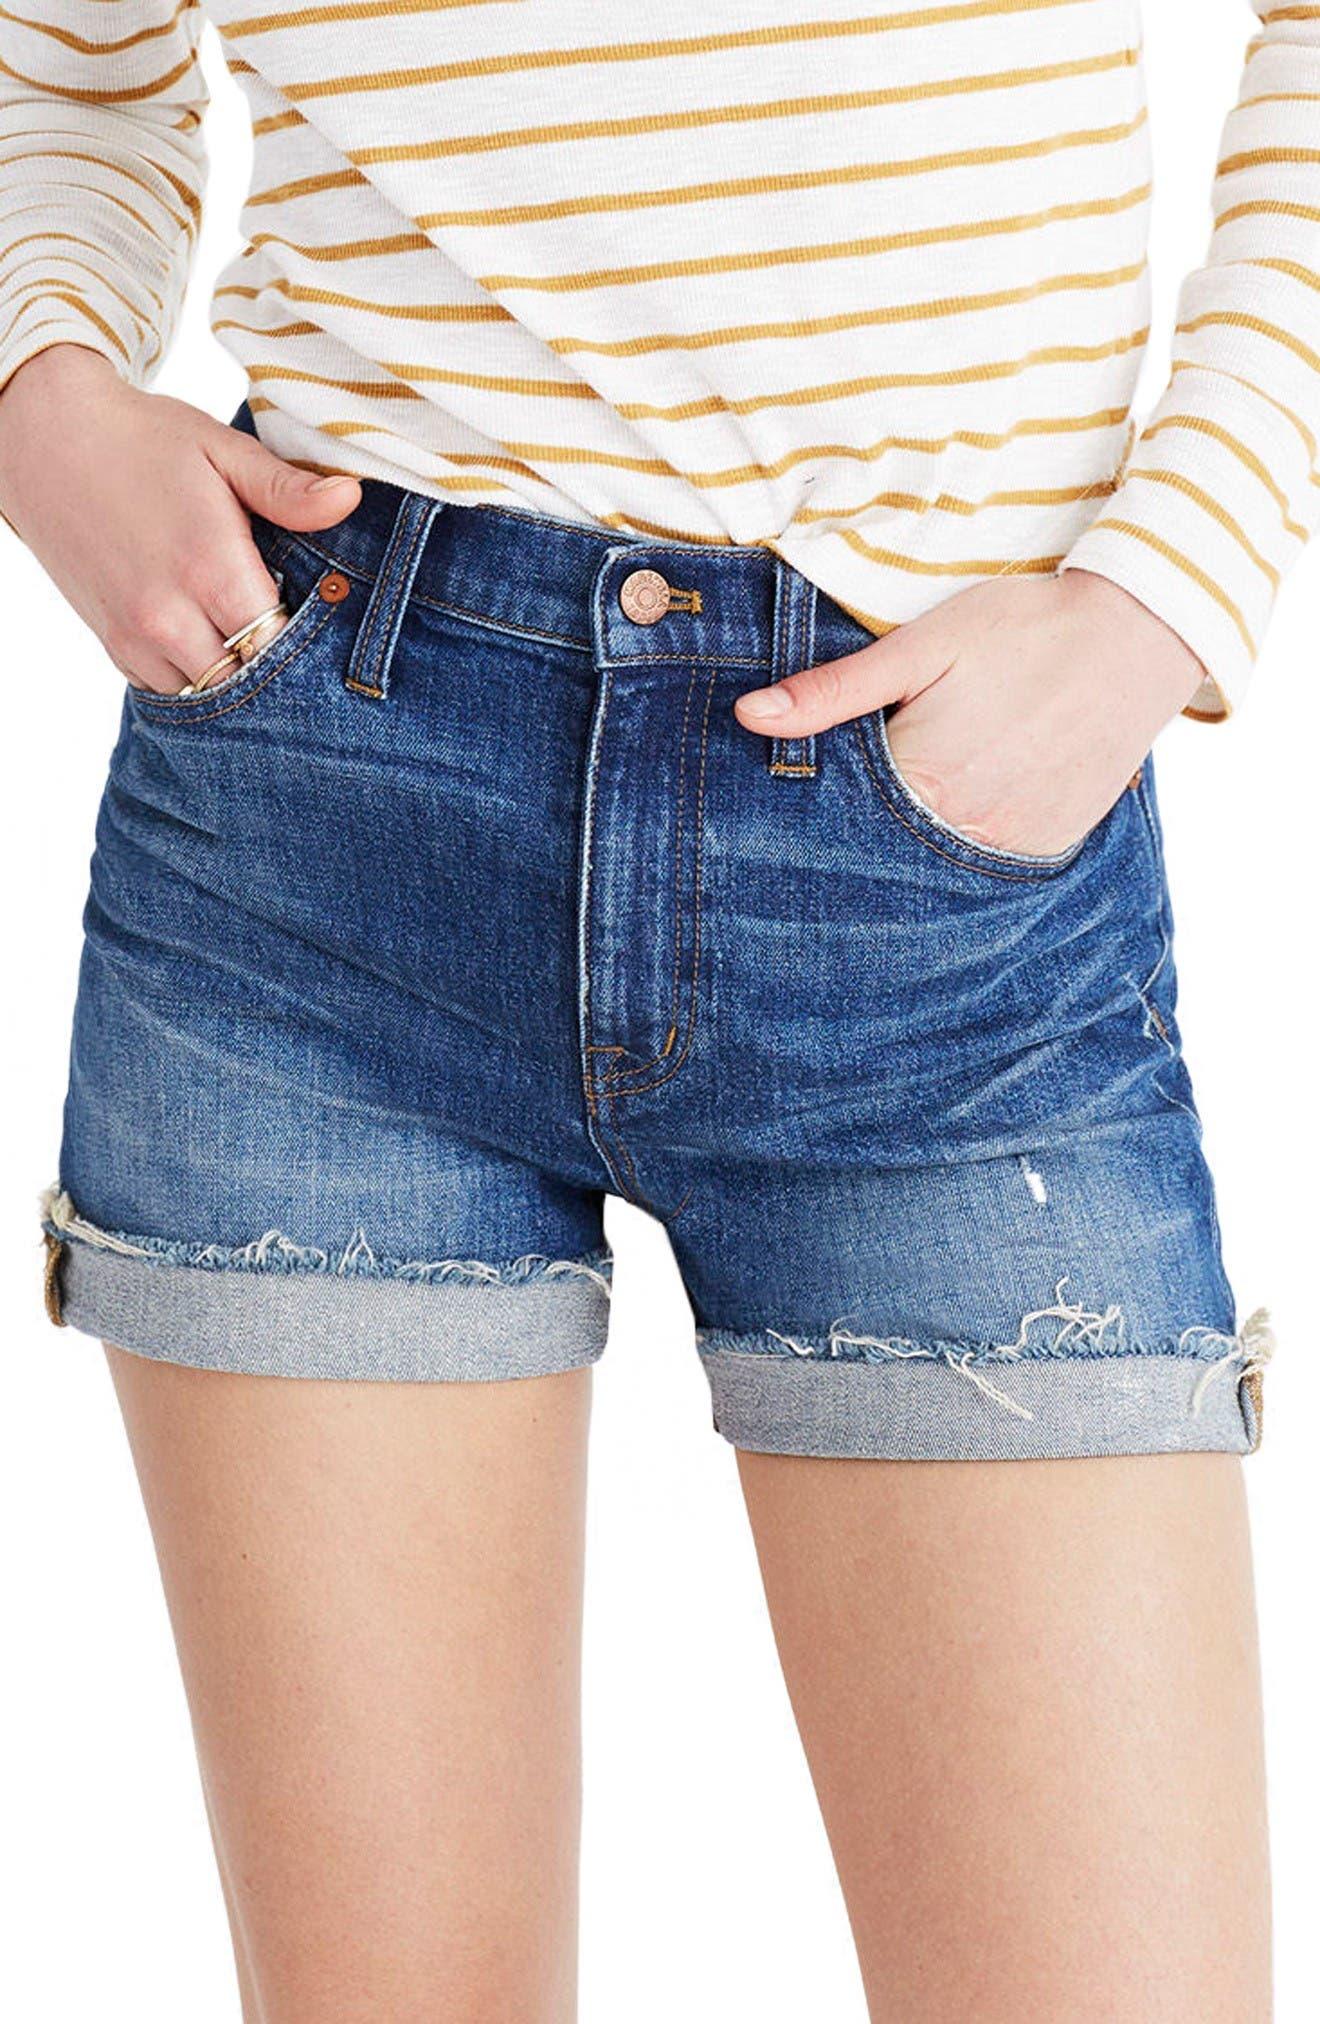 Main Image - Madewell High Rise Cuffed Denim Shorts (Glen Oaks)